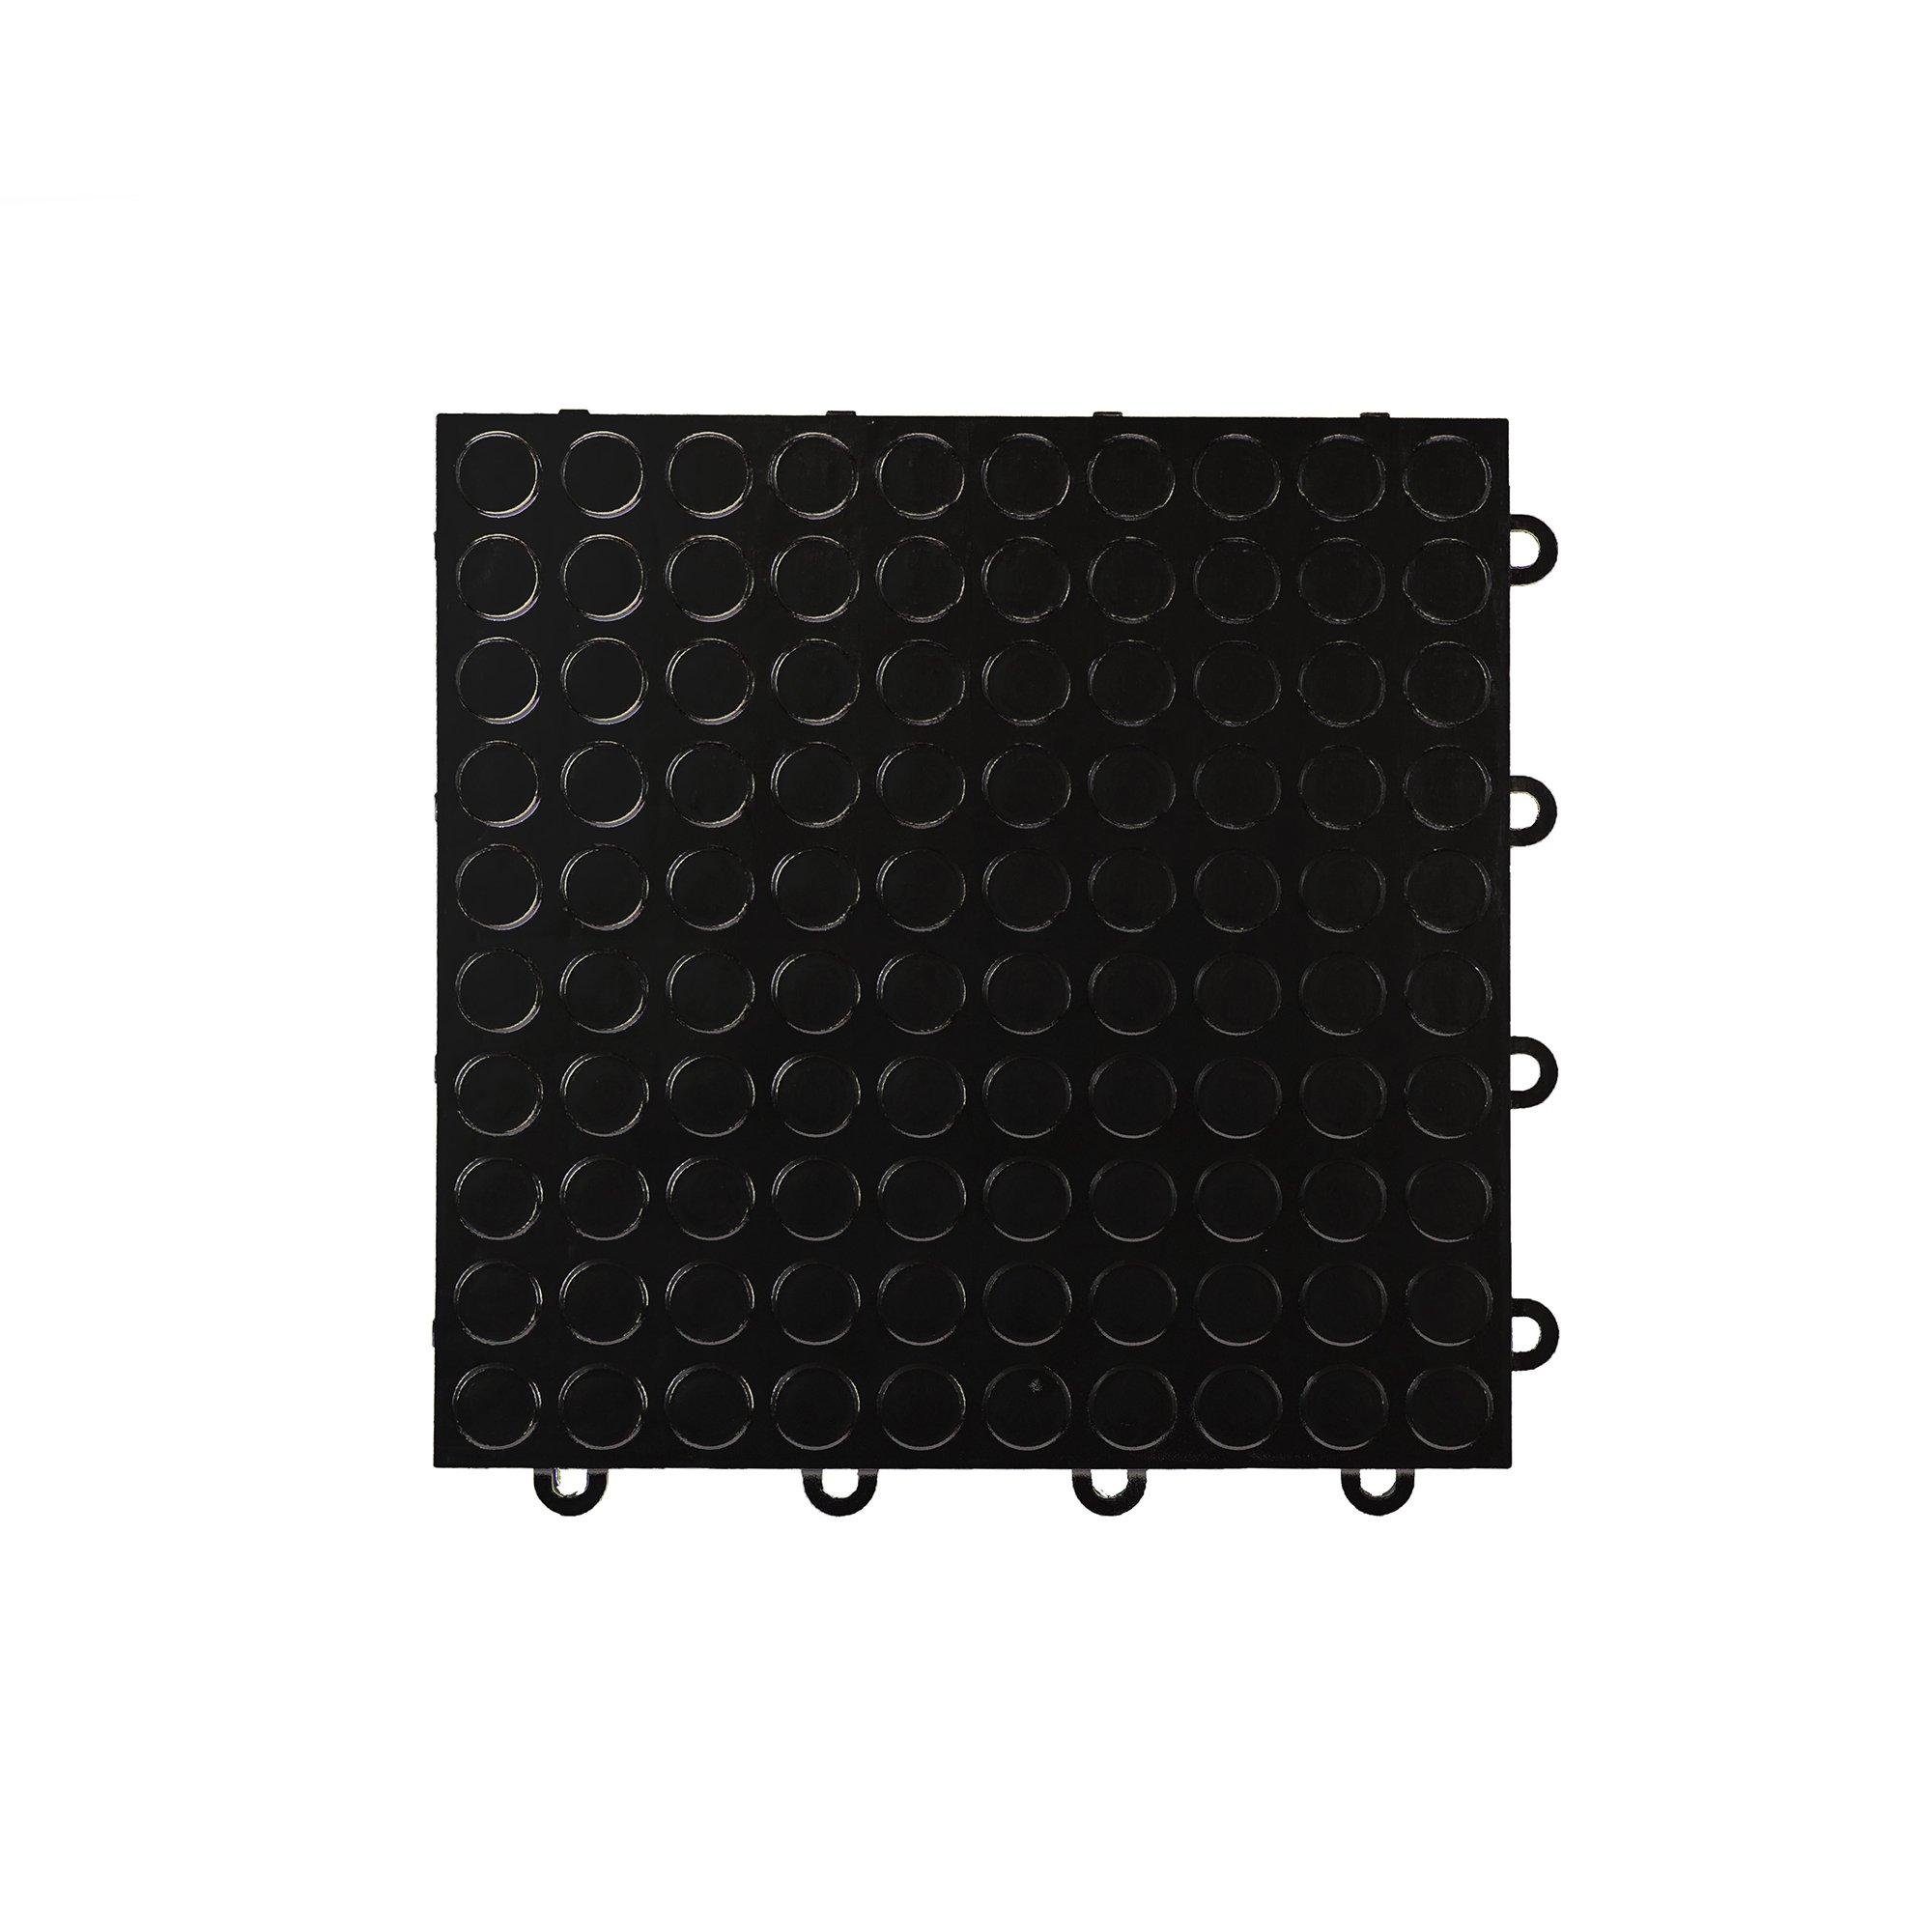 IncStores Coin Nitro Garage Tiles 12''x12'' Interlocking Garage Flooring (Black - 52-12''x12'' Tiles)